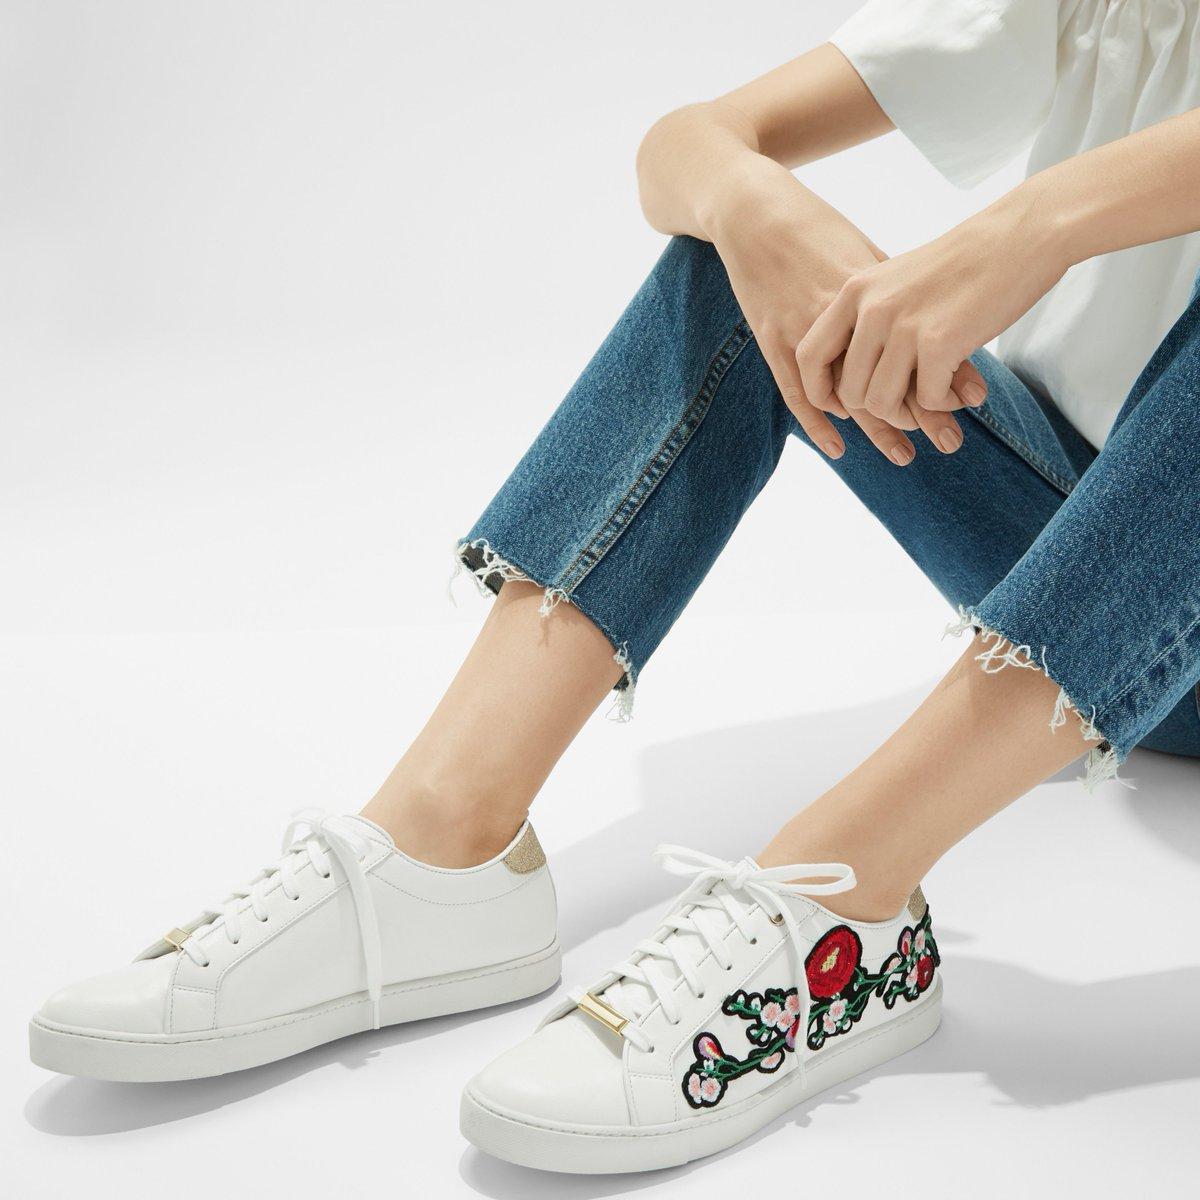 aldo shoes best sellers